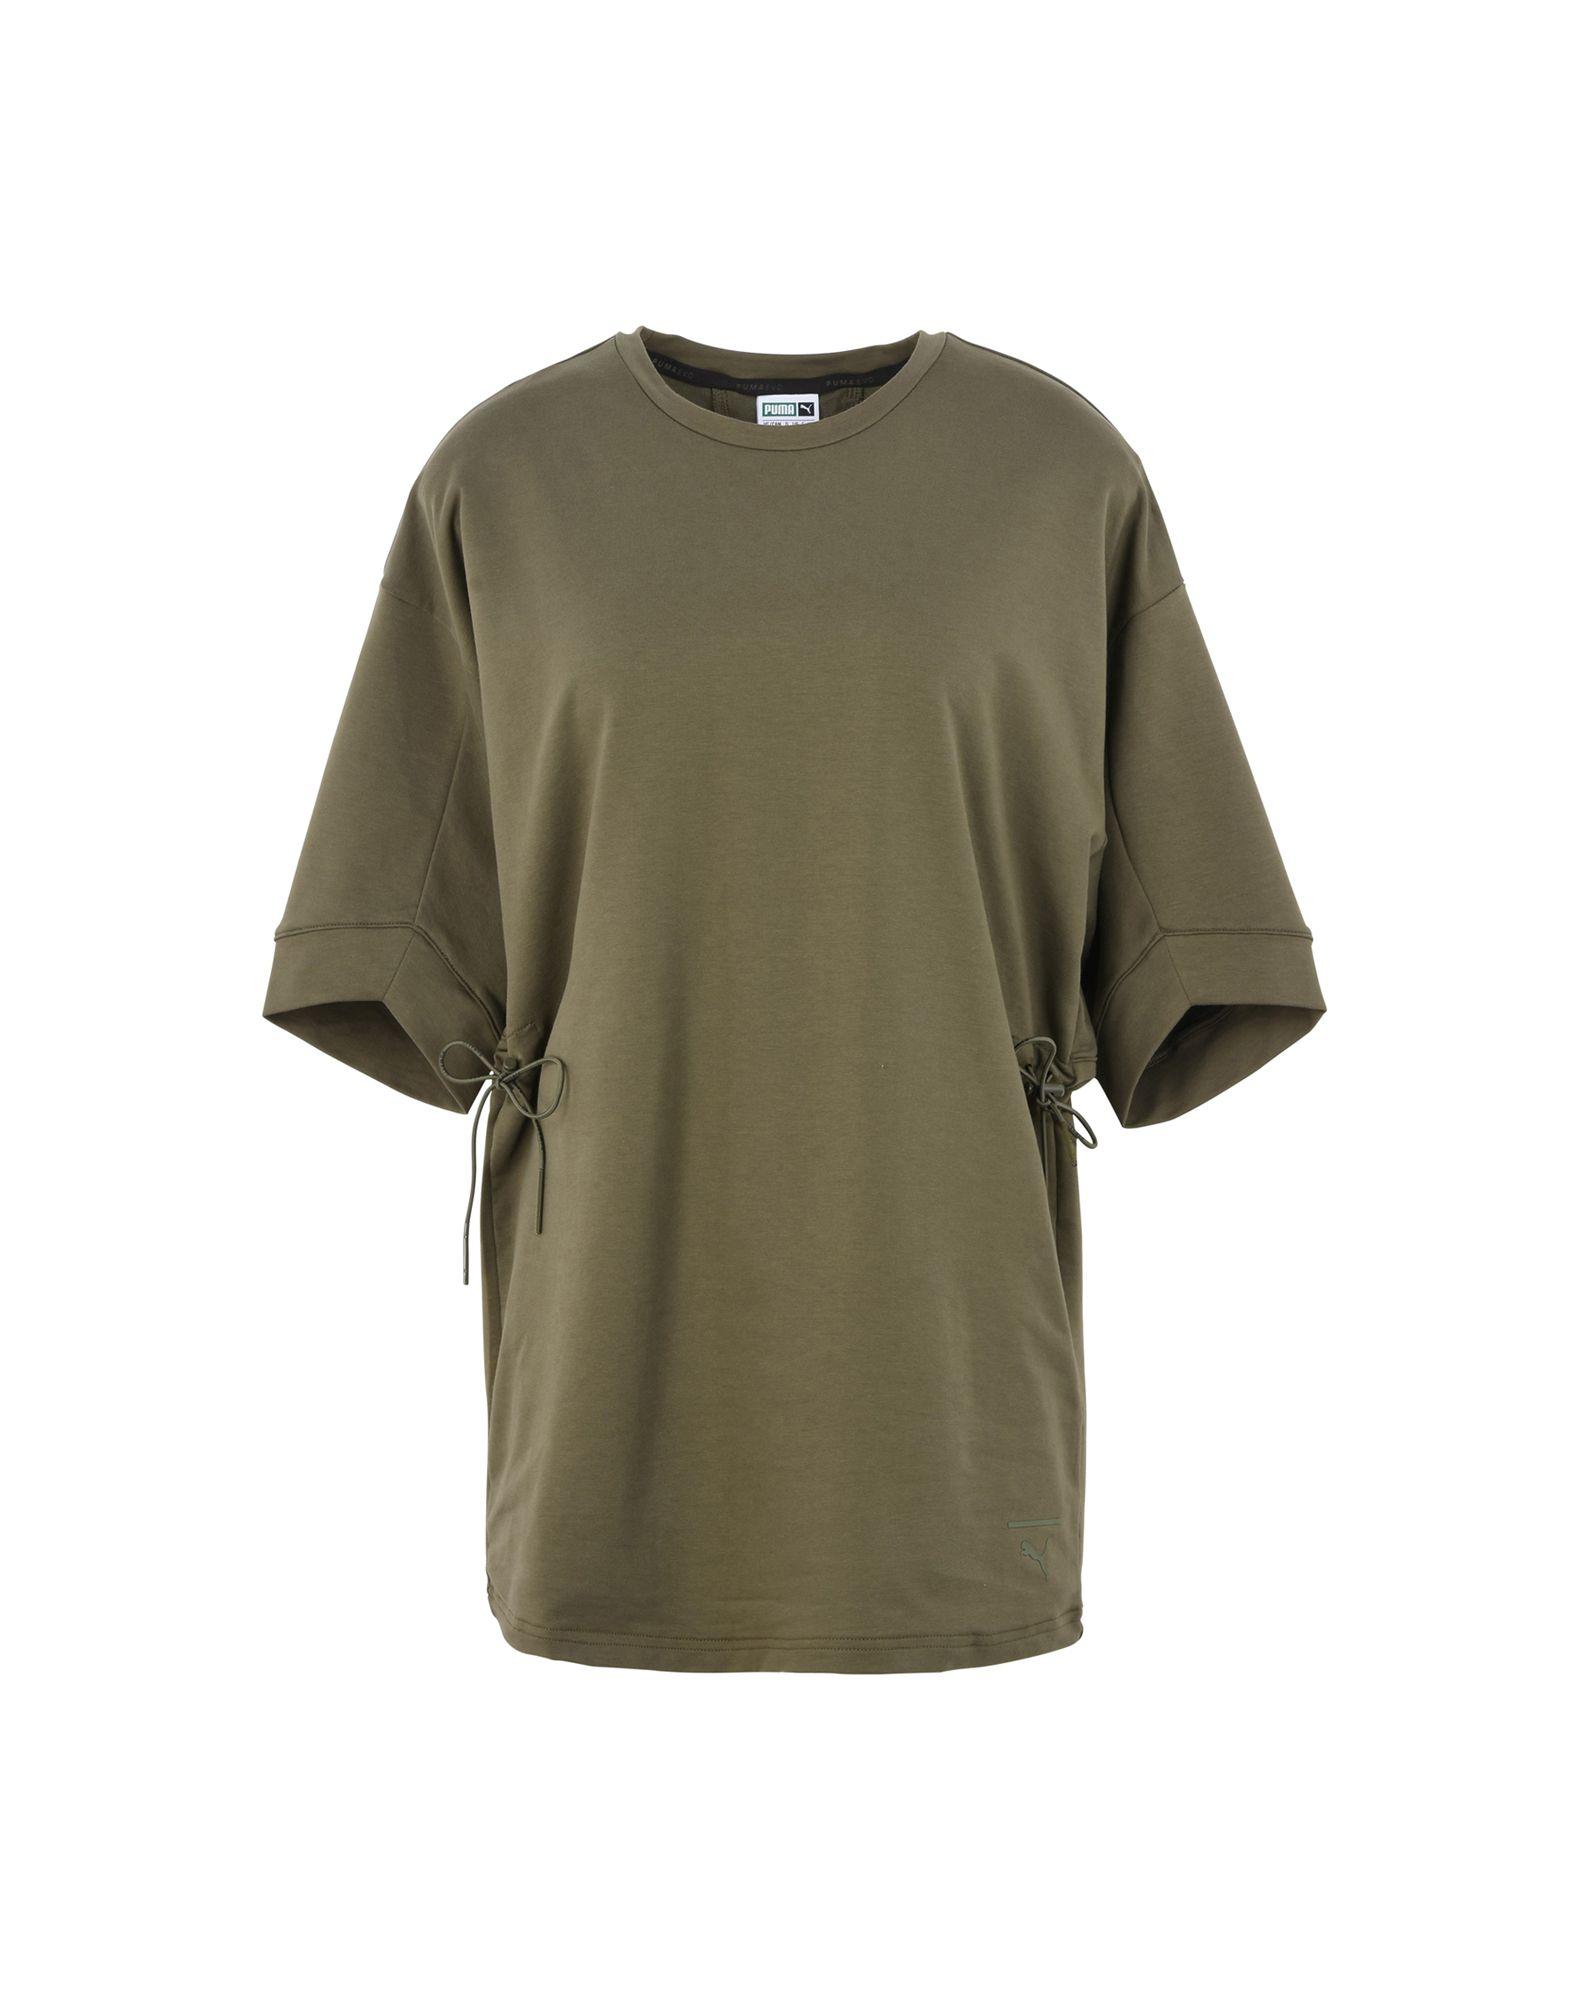 PUMA Damen Sweatshirt3 grün